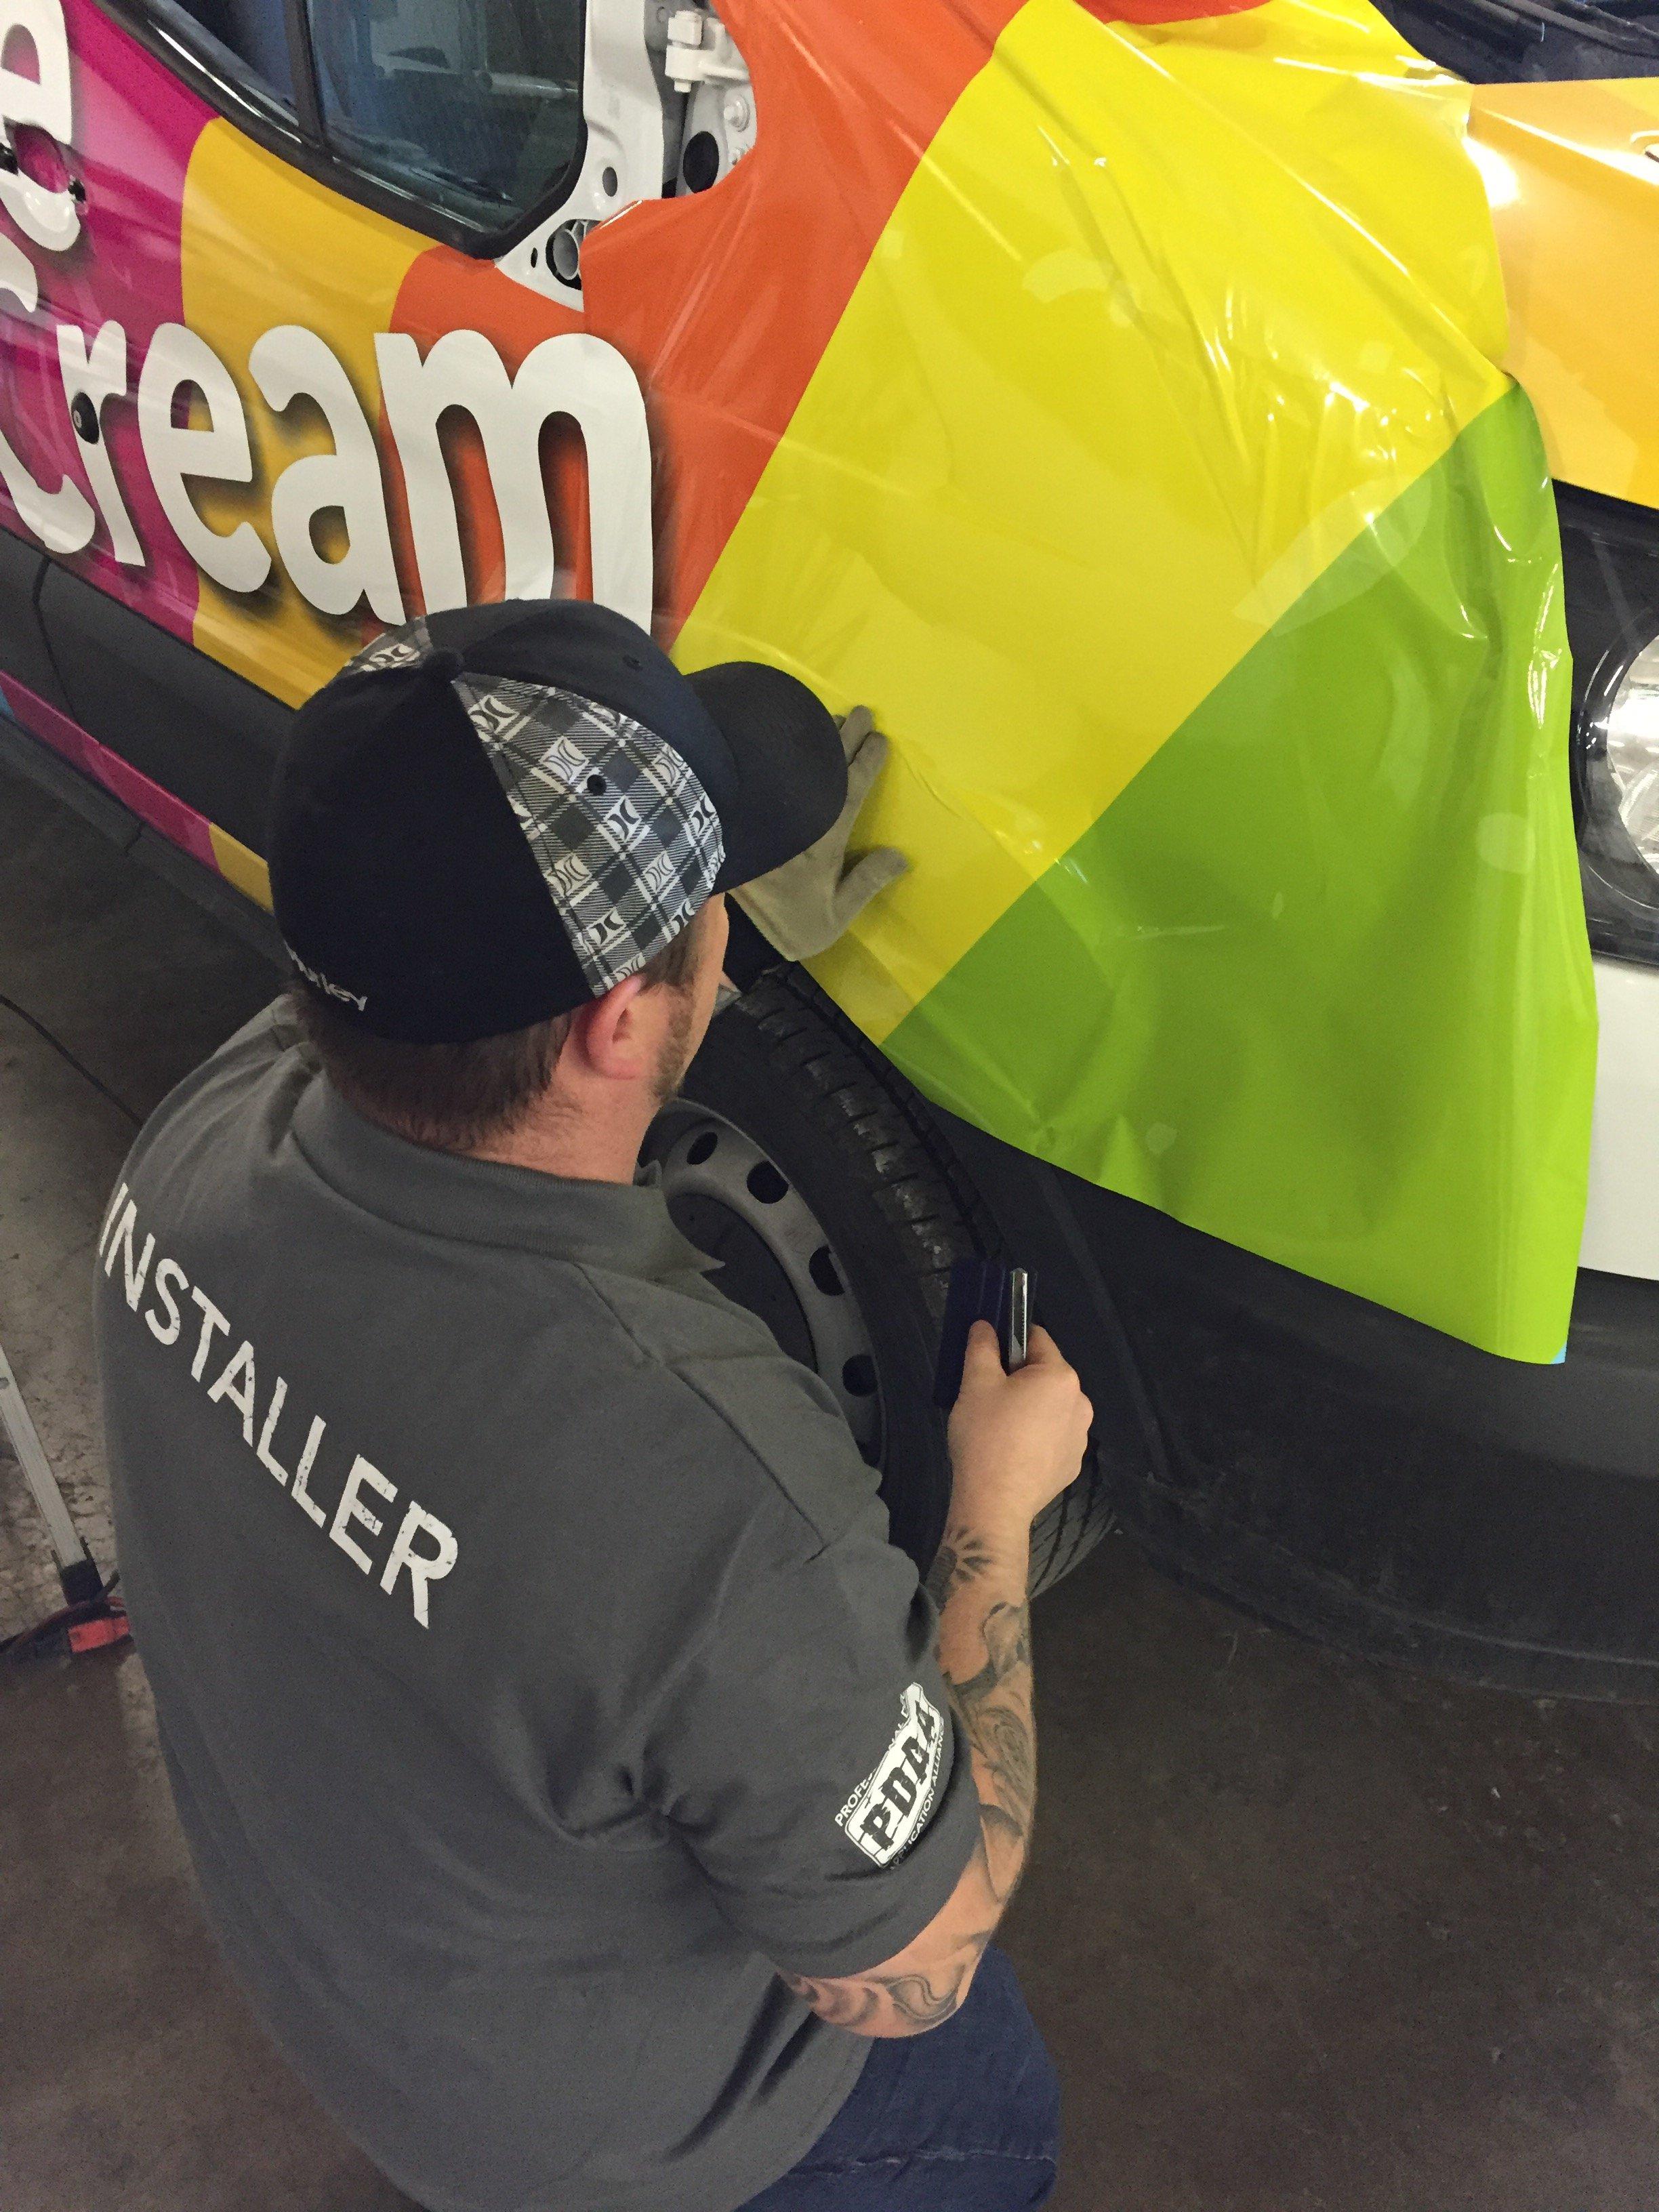 VMS vehicle wrap installer